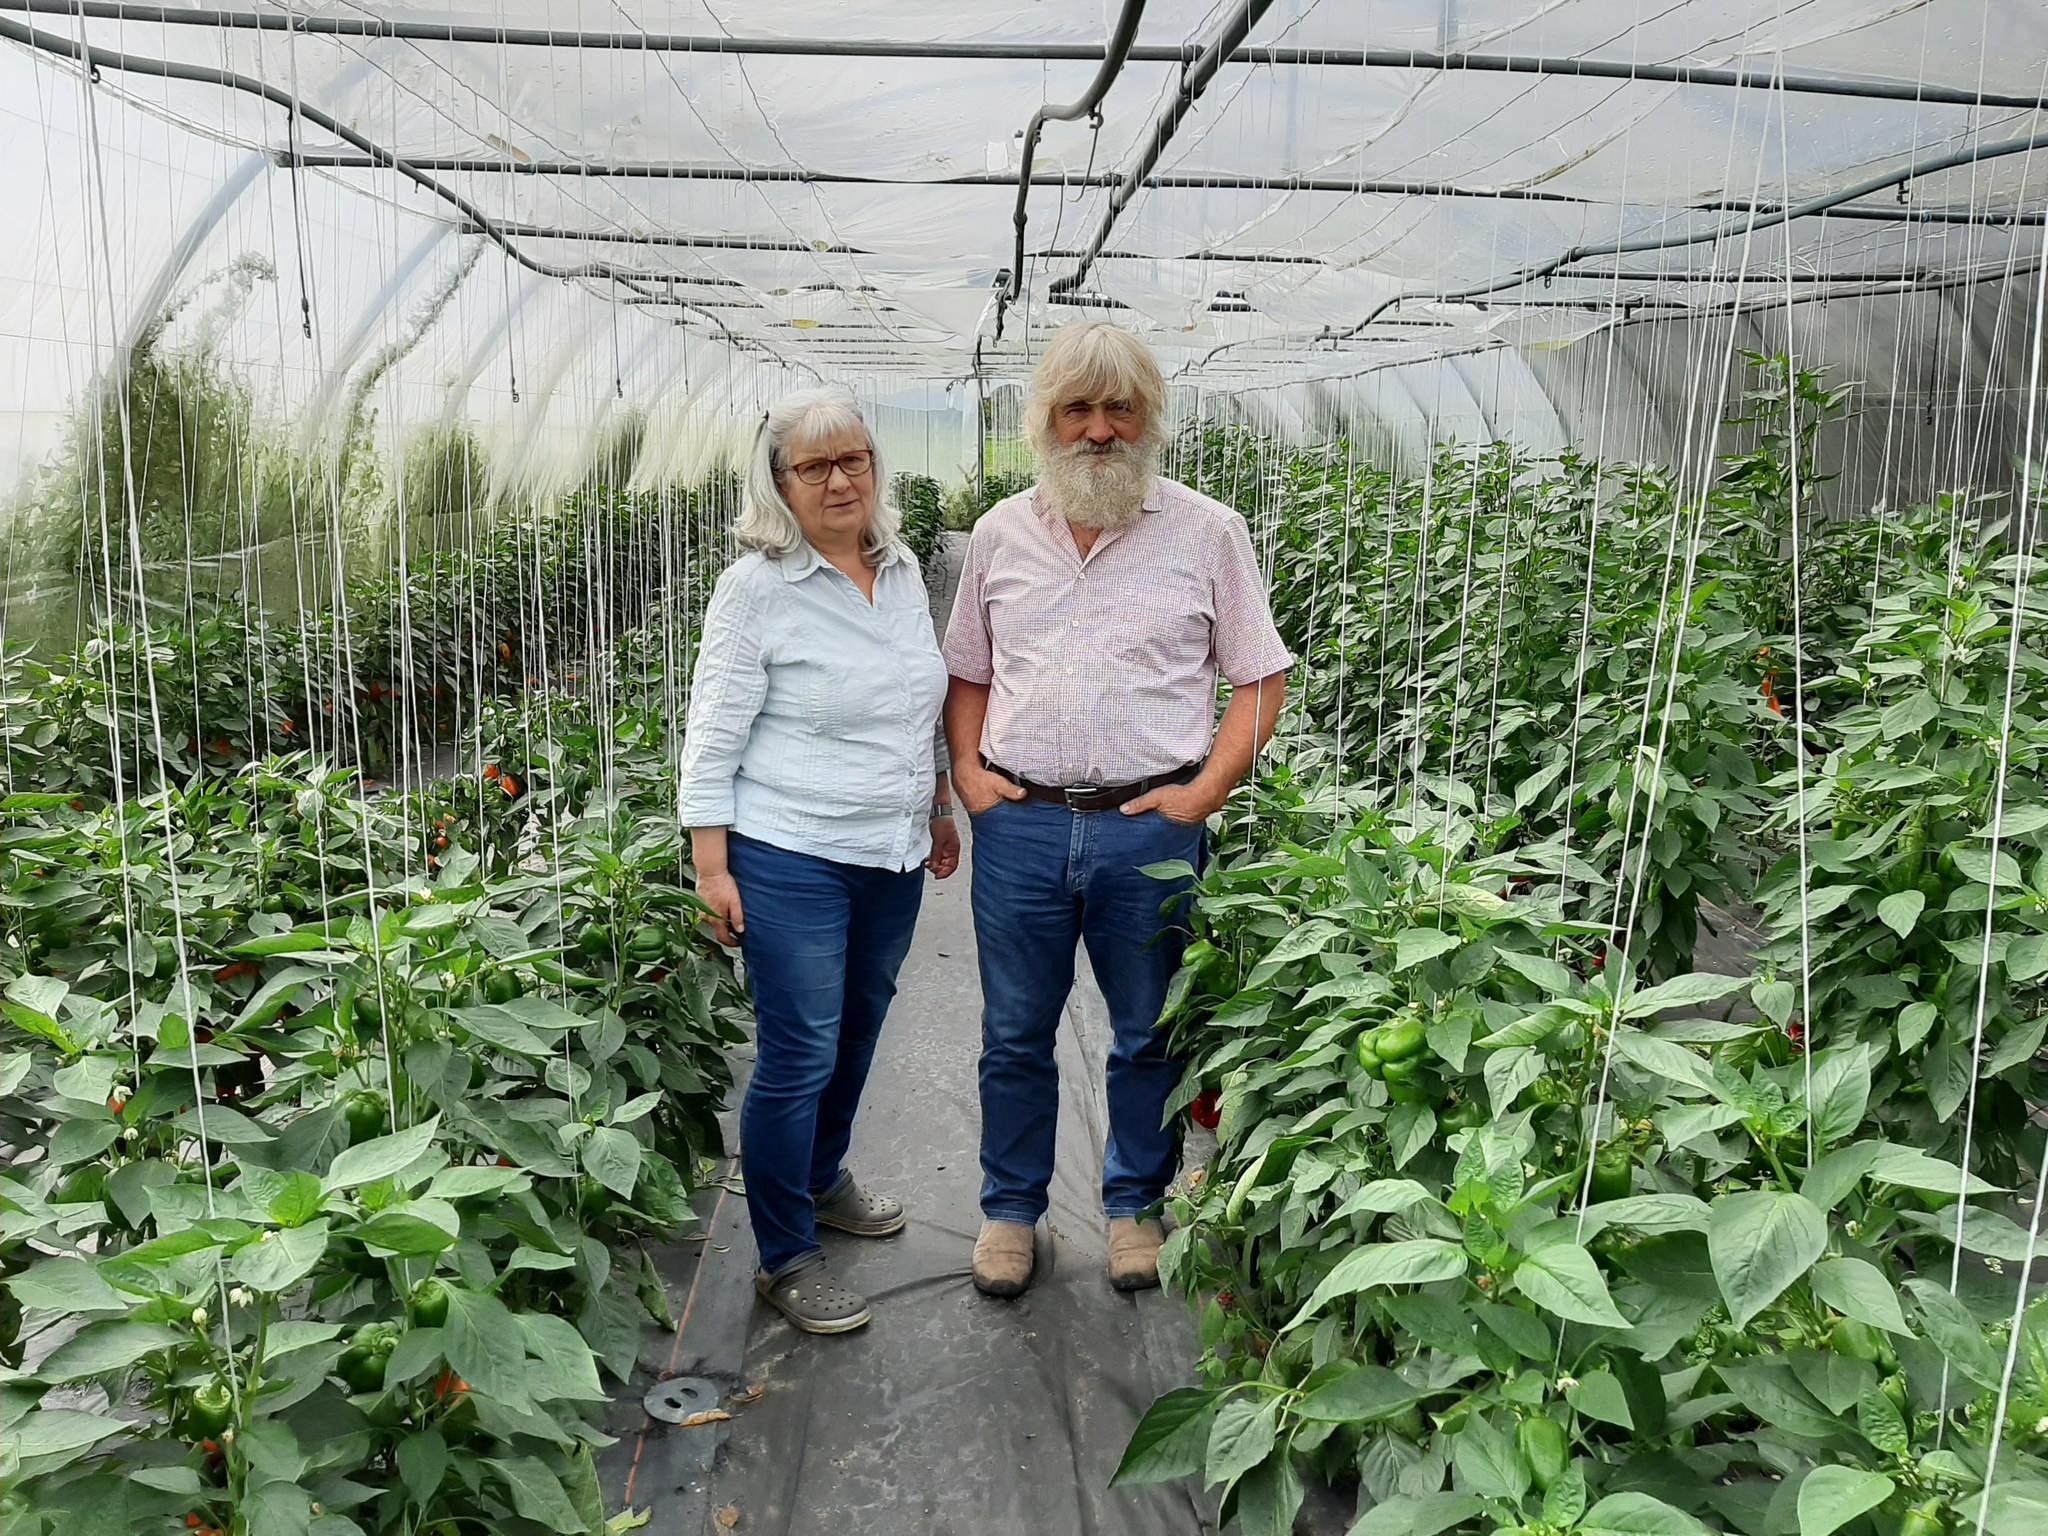 Silvia & Pius Grünenfelder